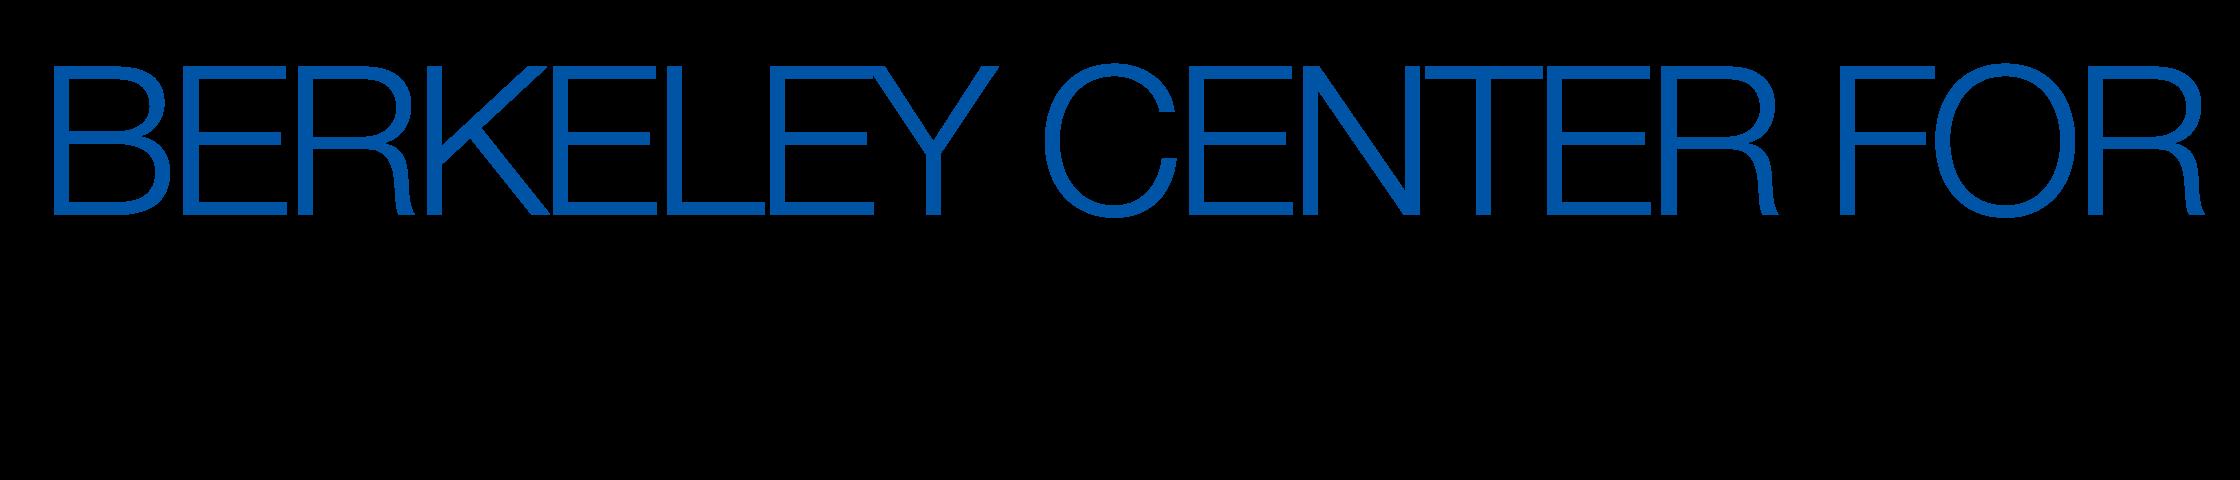 Berkeley Center for Law & Technology